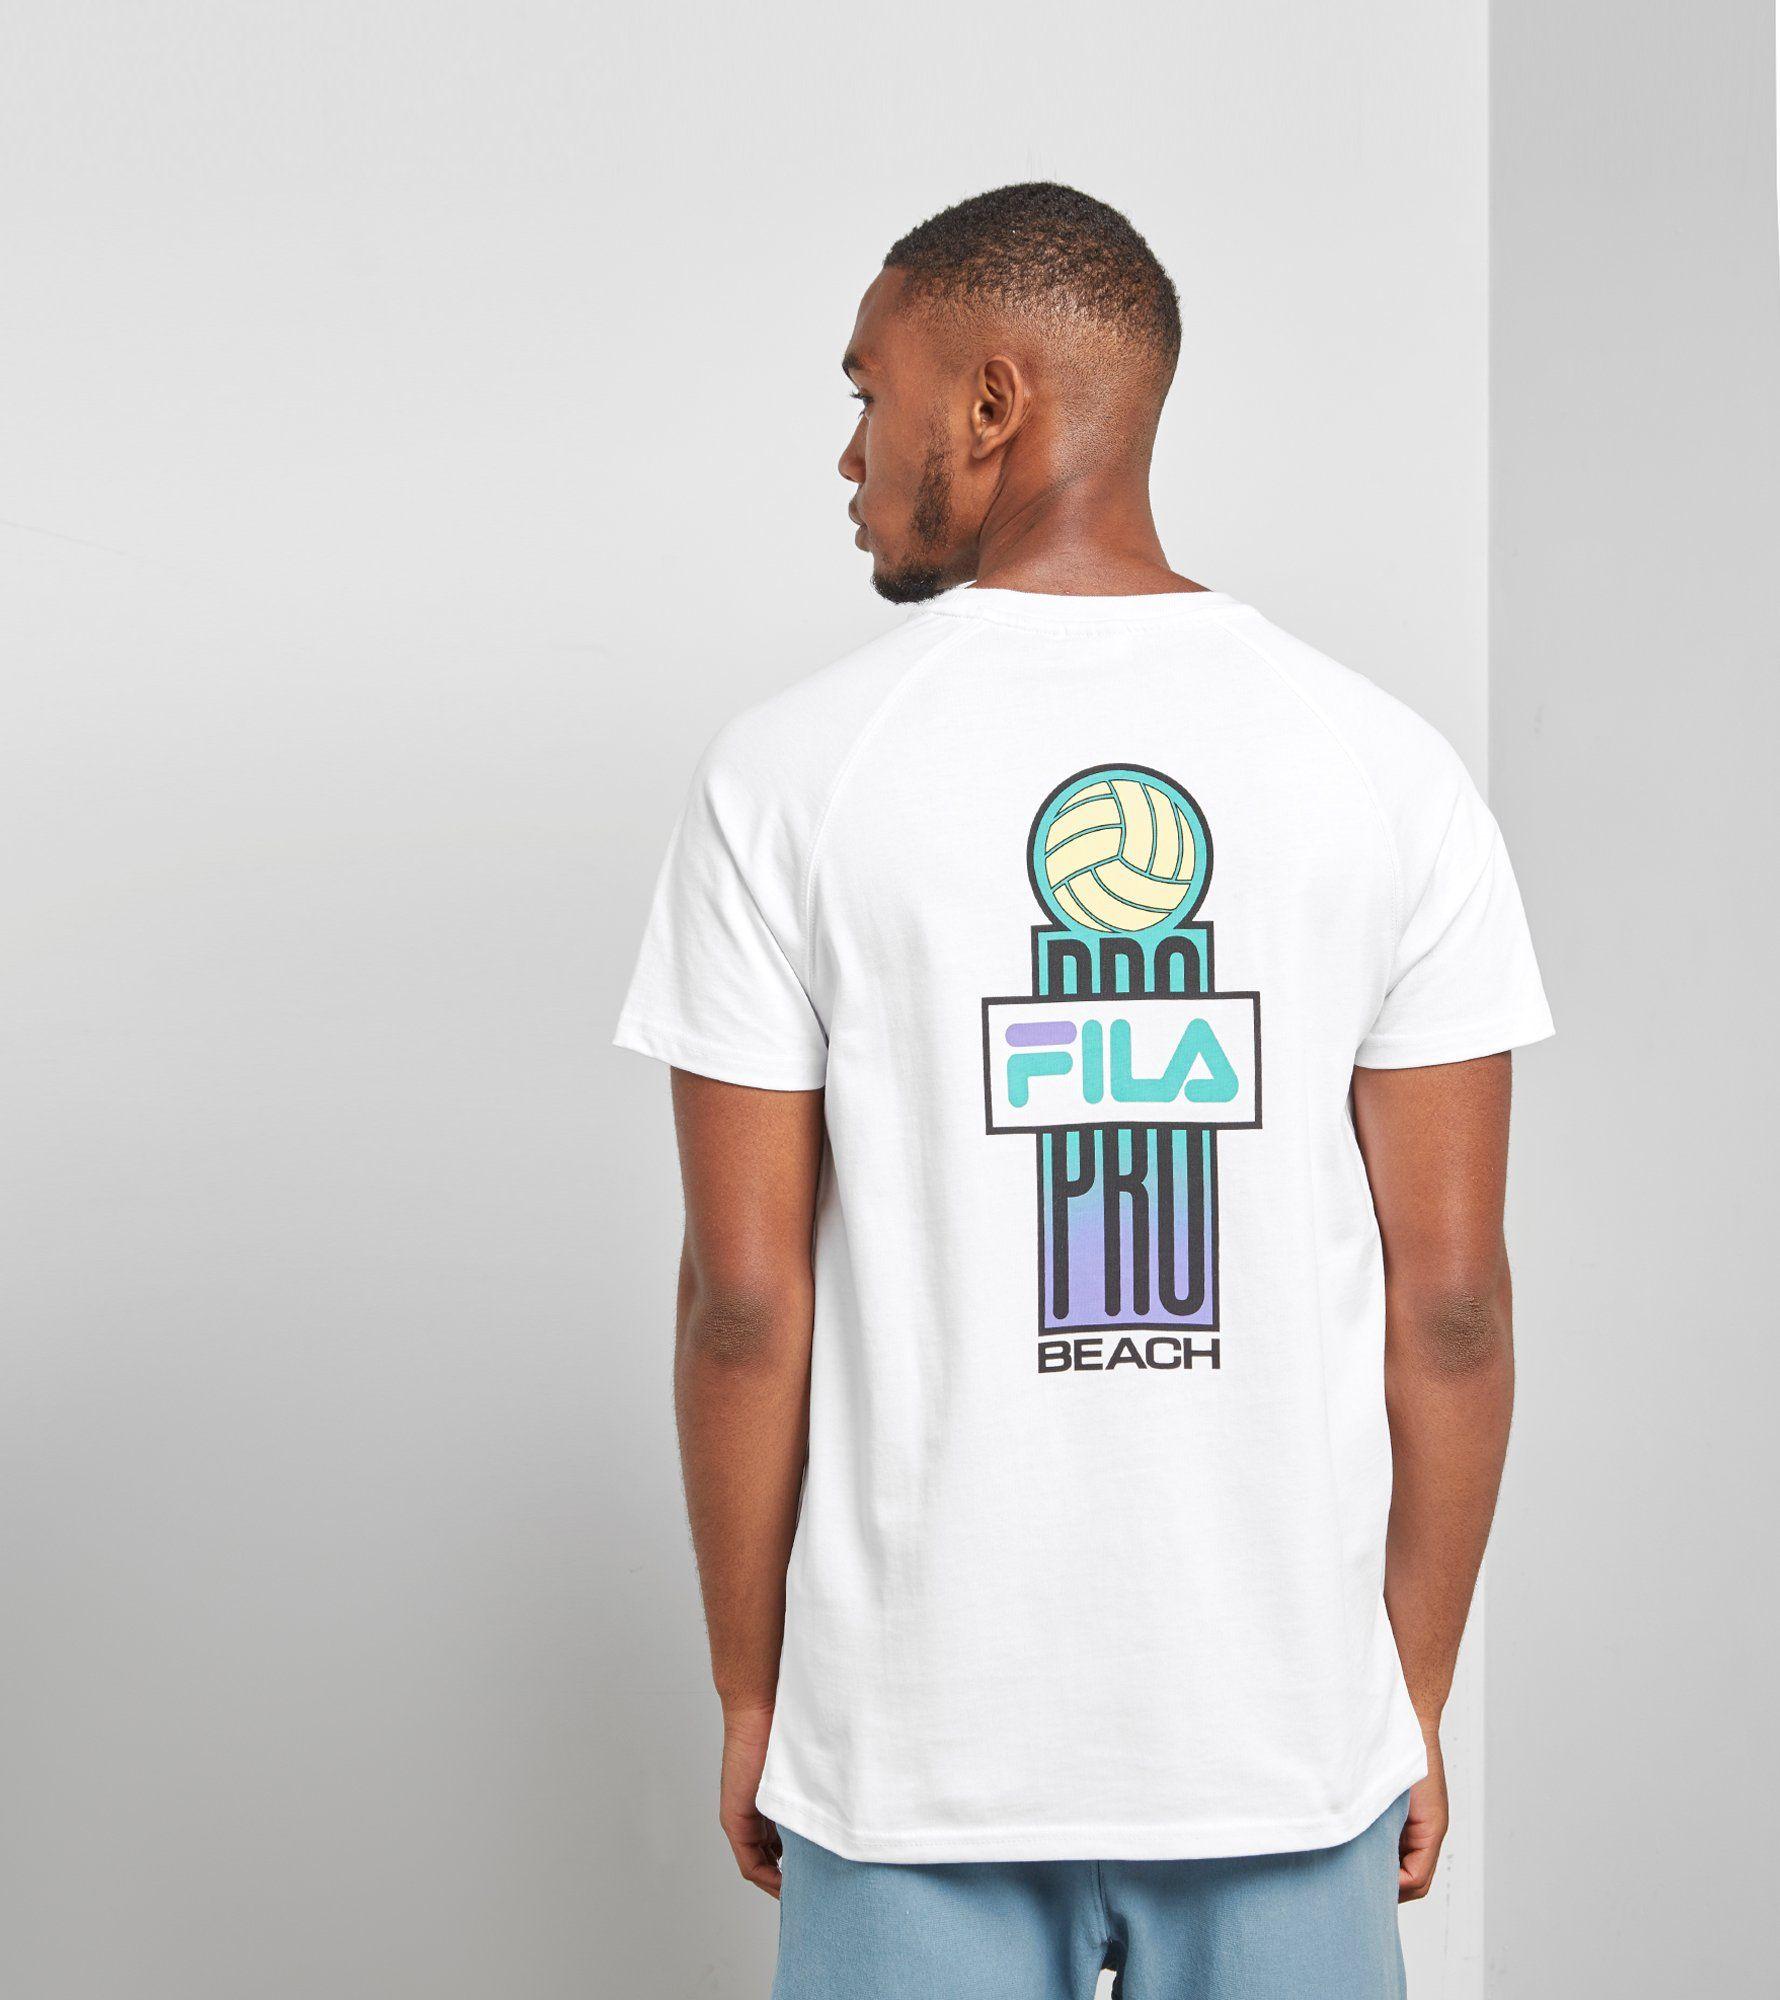 Fila Pro Beach T-Shirt